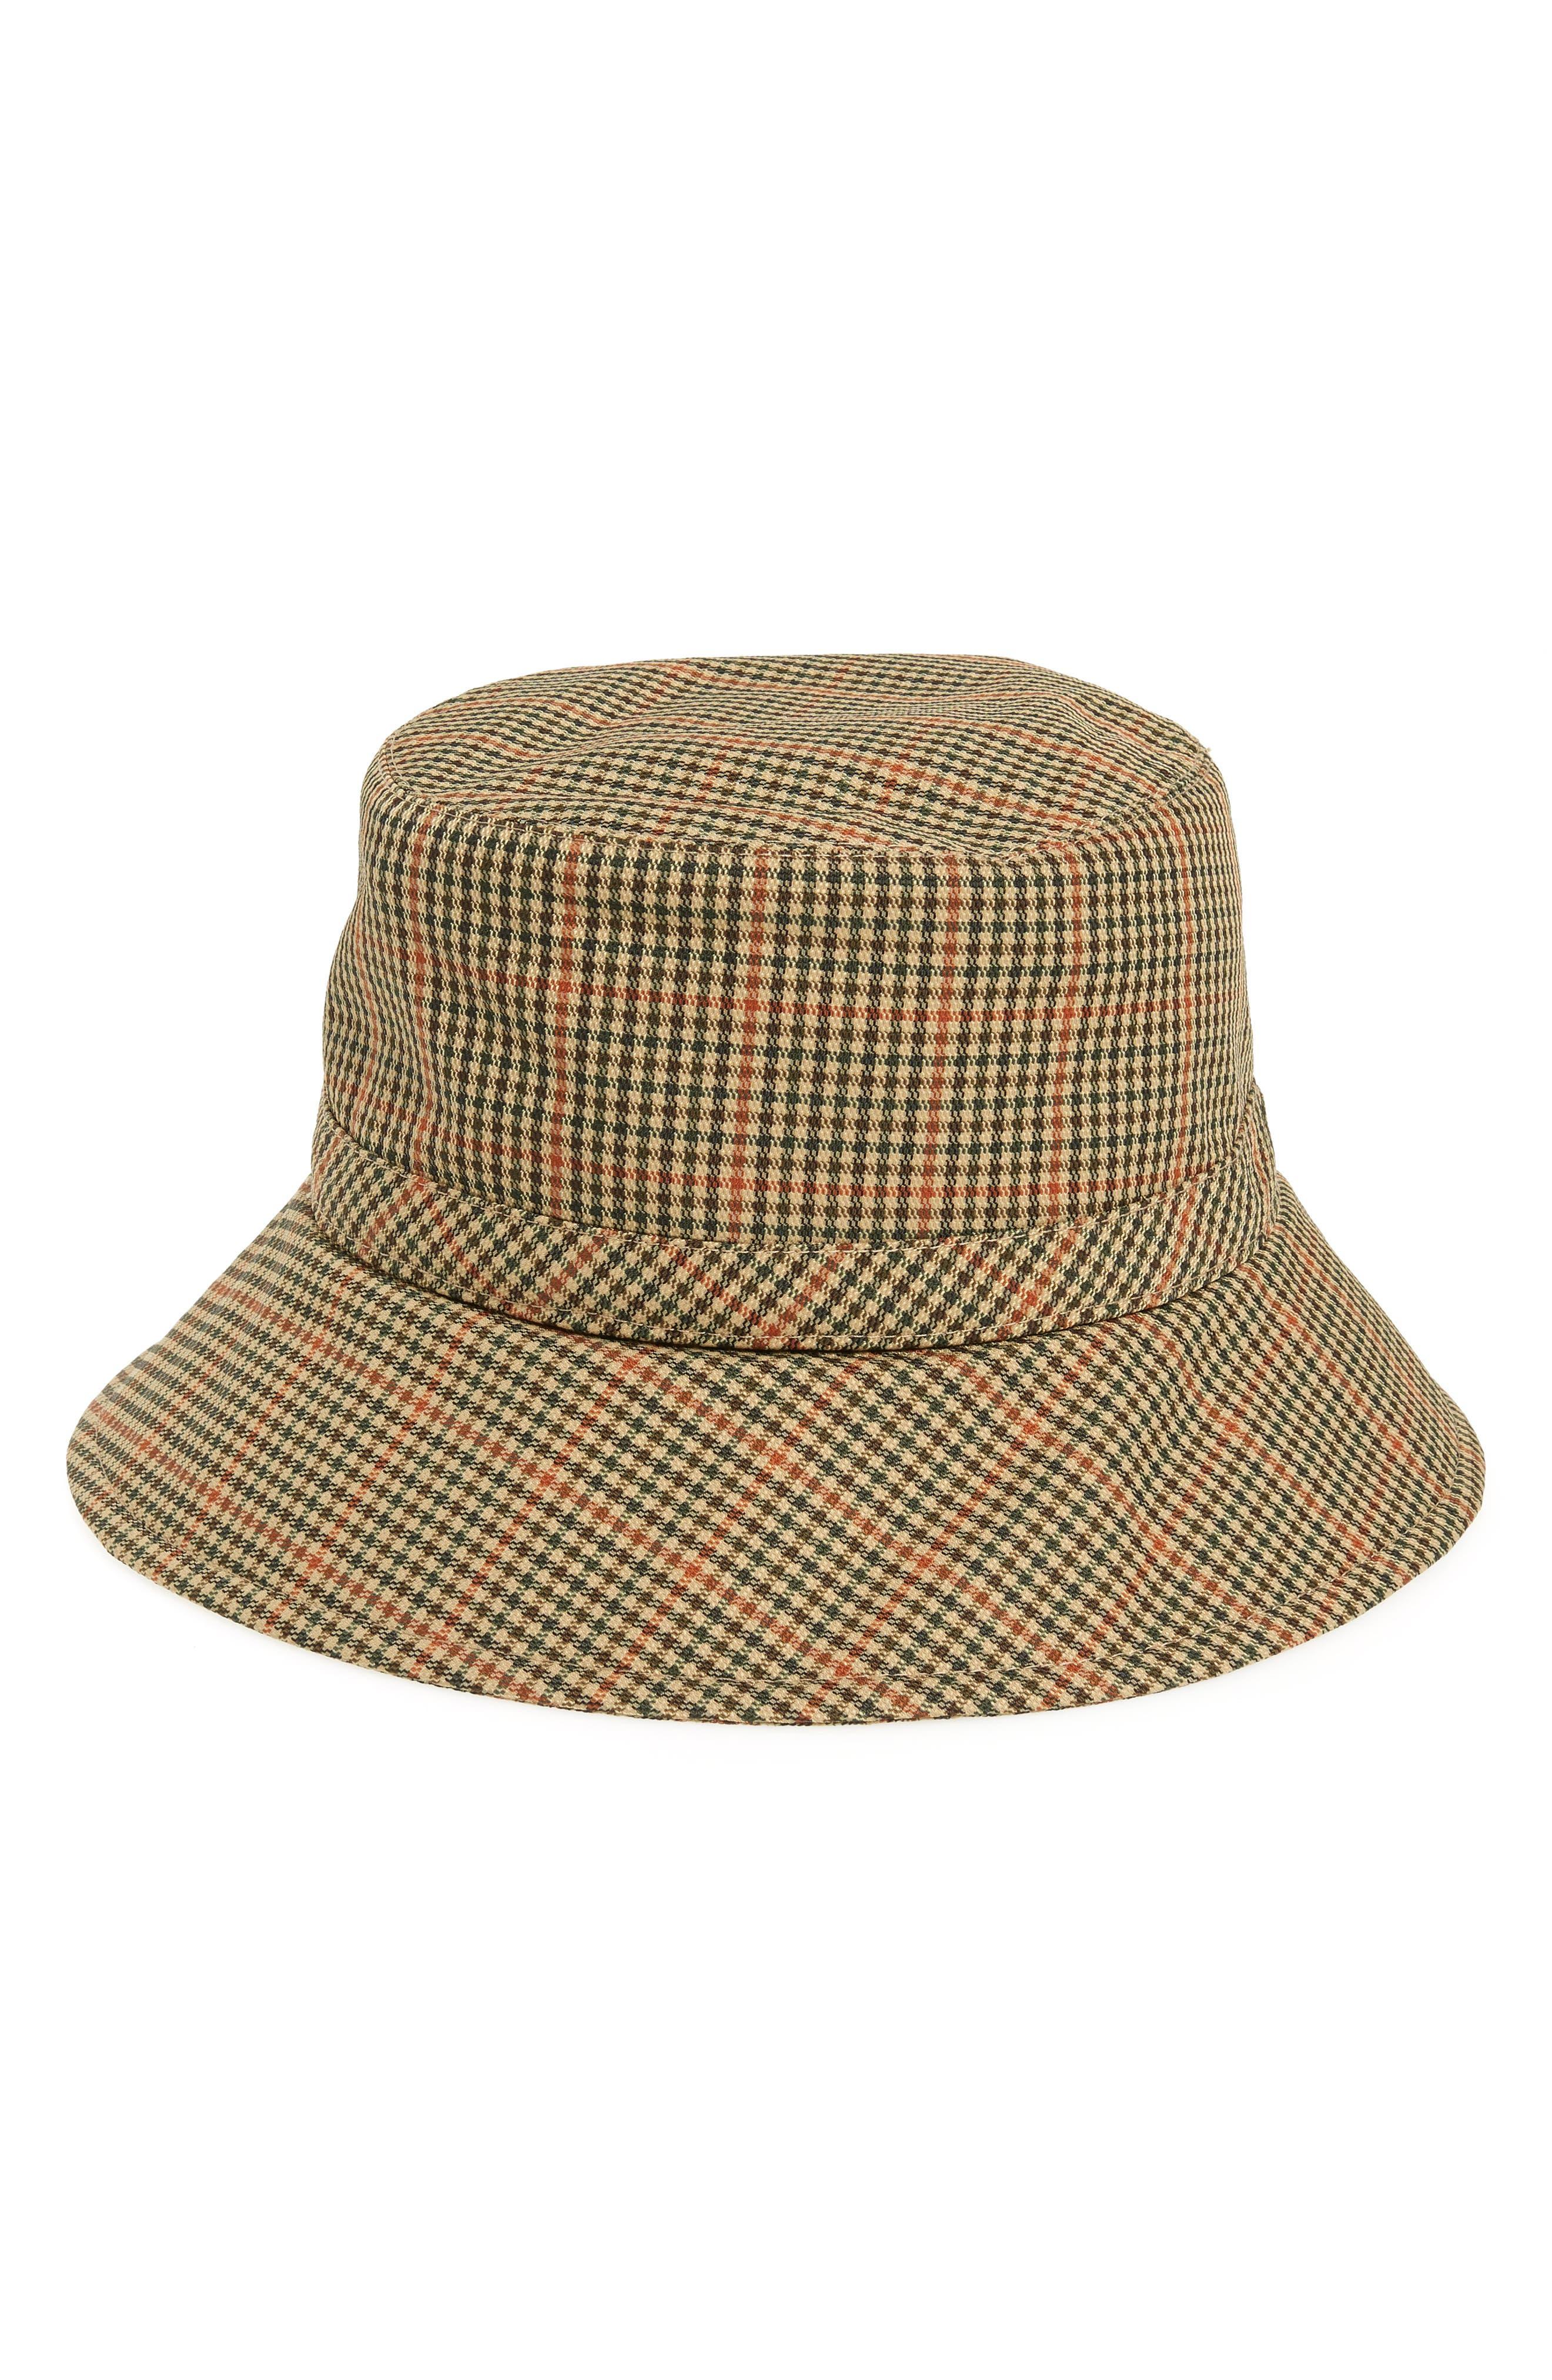 Rain Bucket Hat,                         Main,                         color,